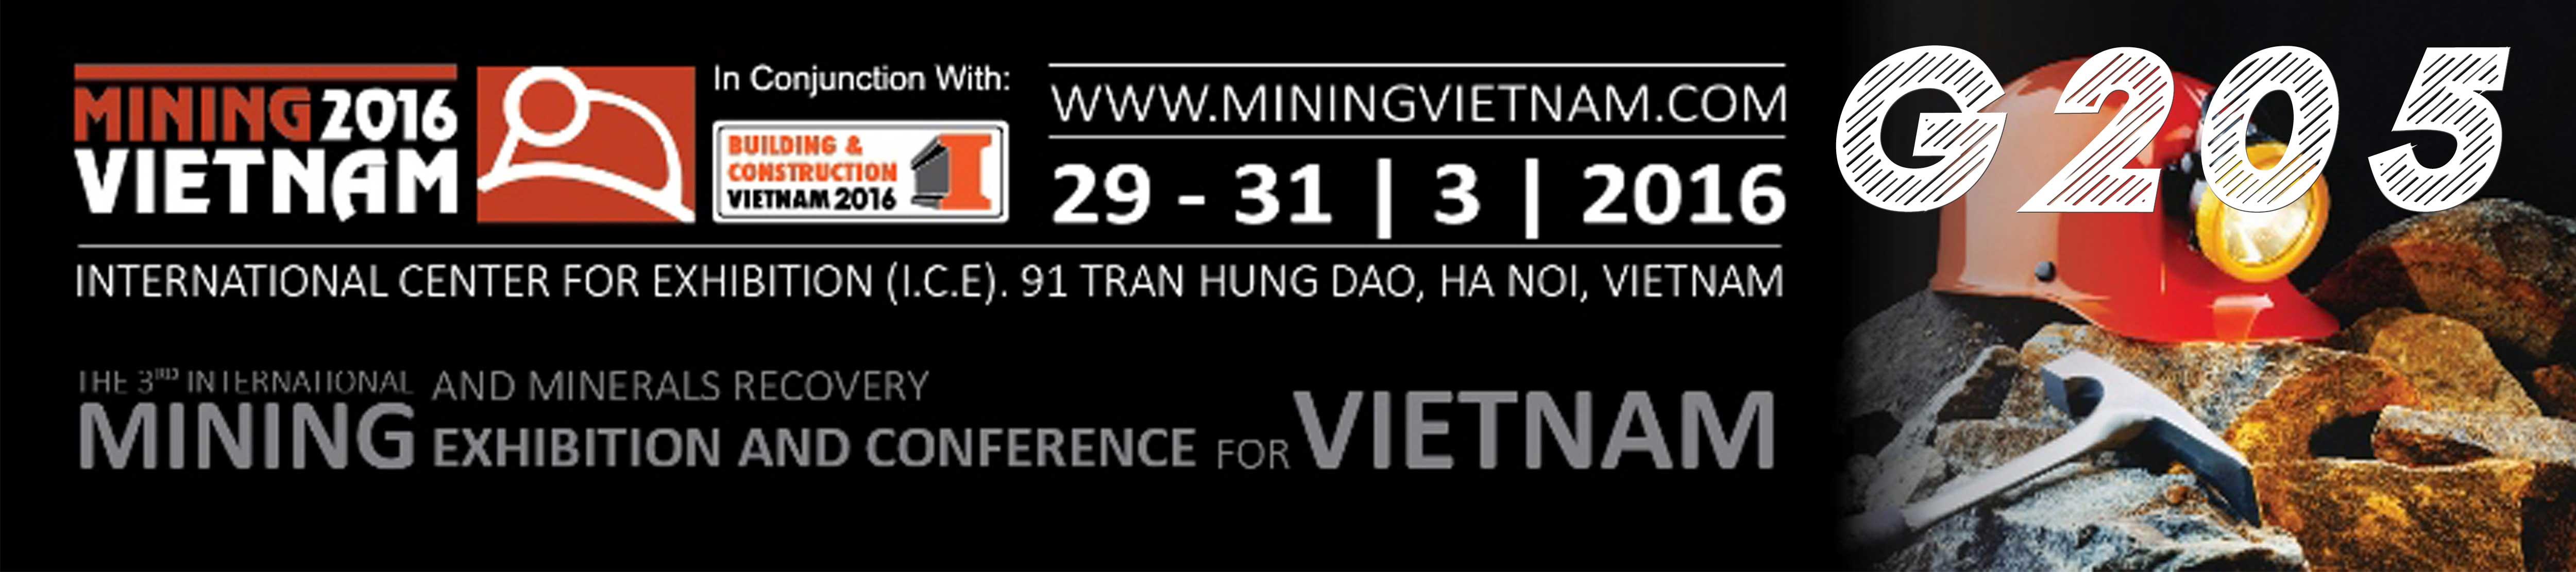 Welcome to Mining Vietnam